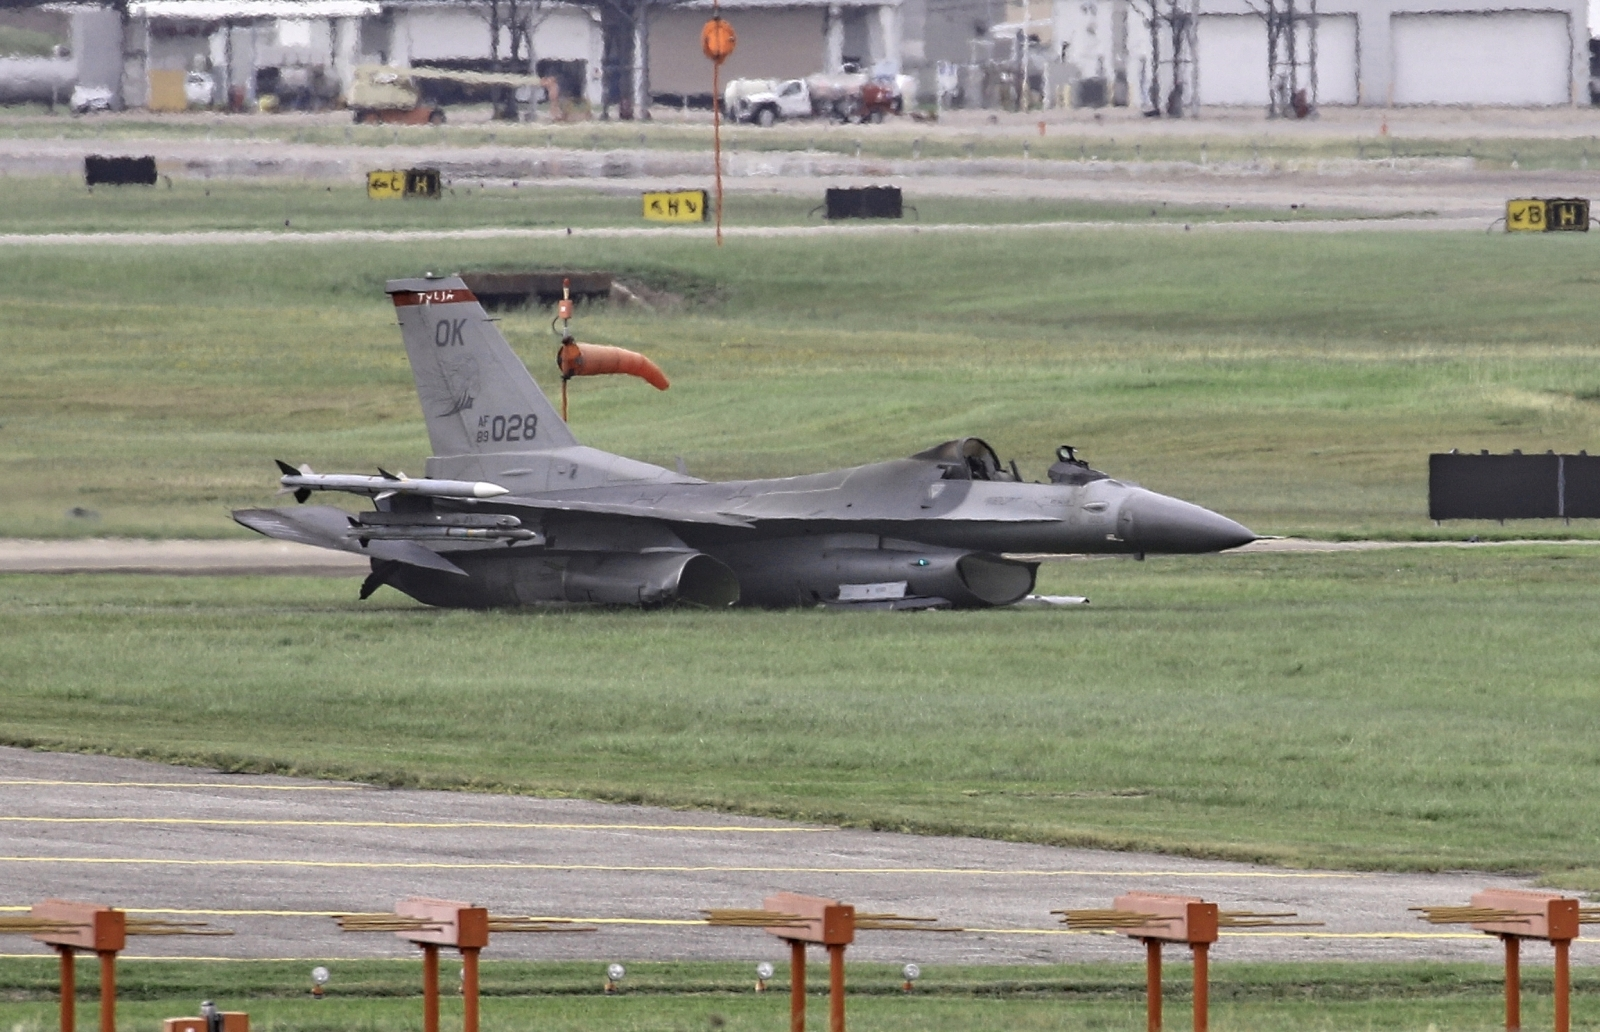 F-16 at Ellington Airfield